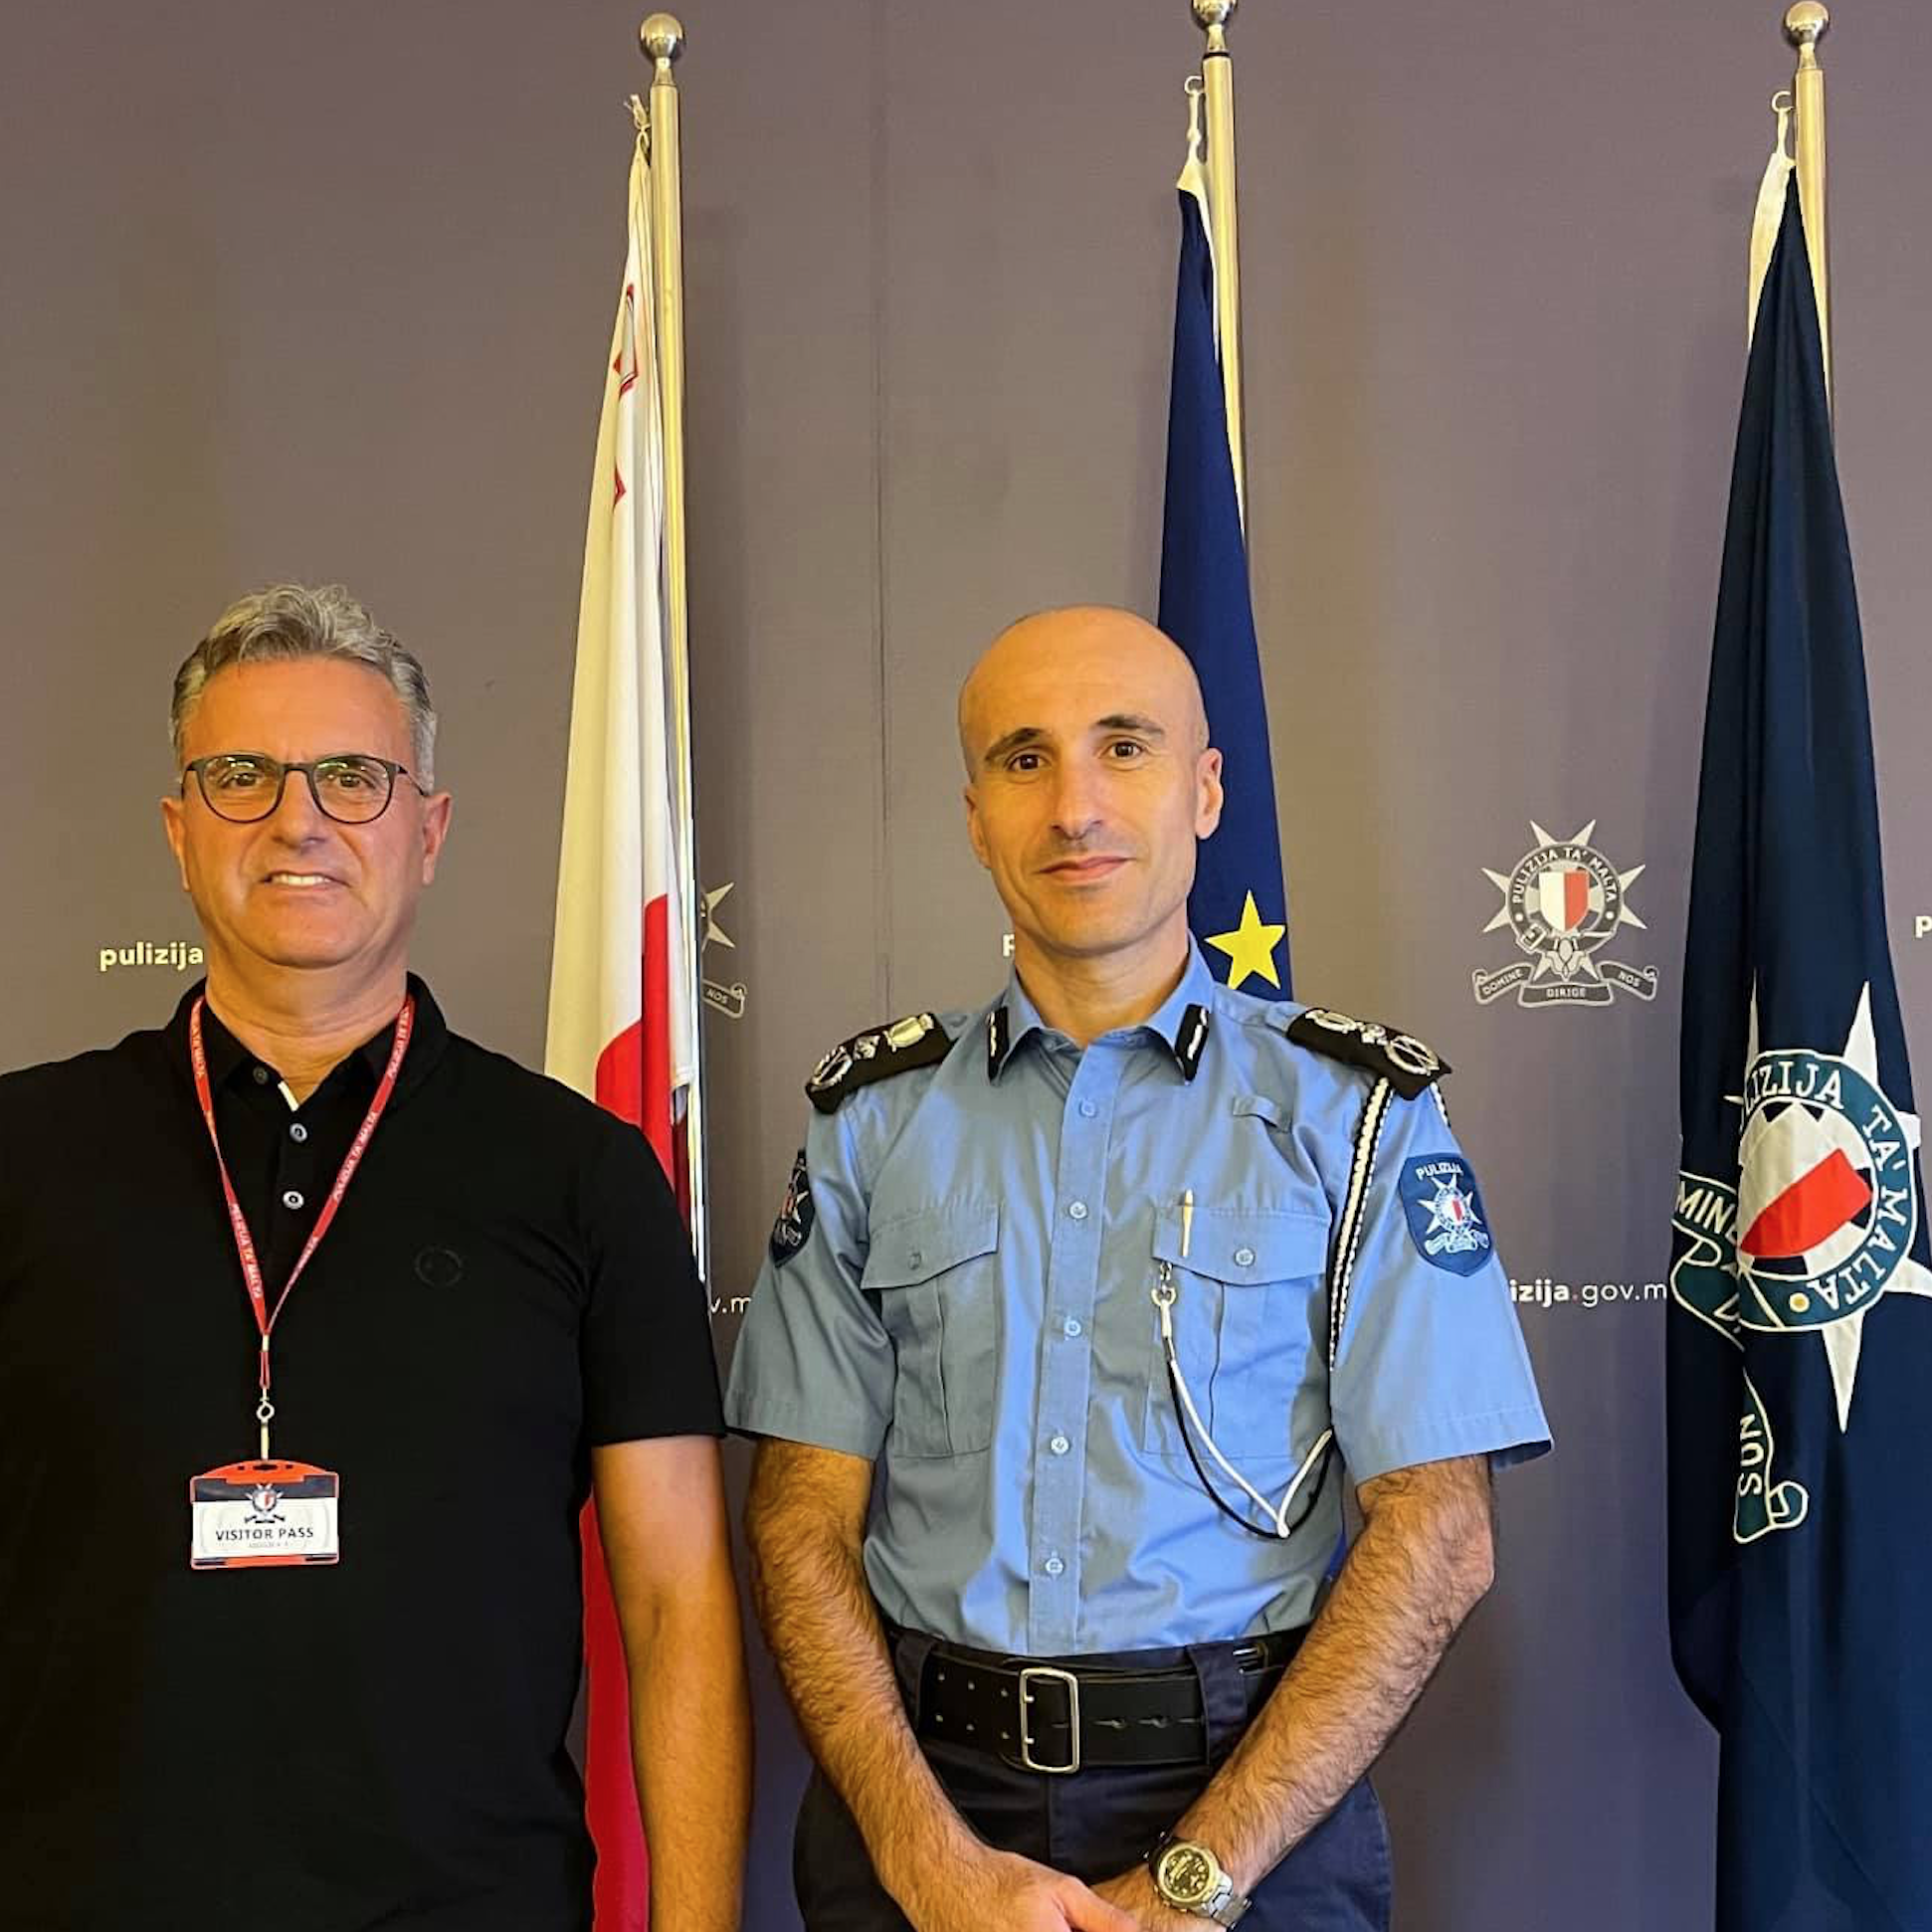 LANDSBERG meets MALTA POLICE FORCE